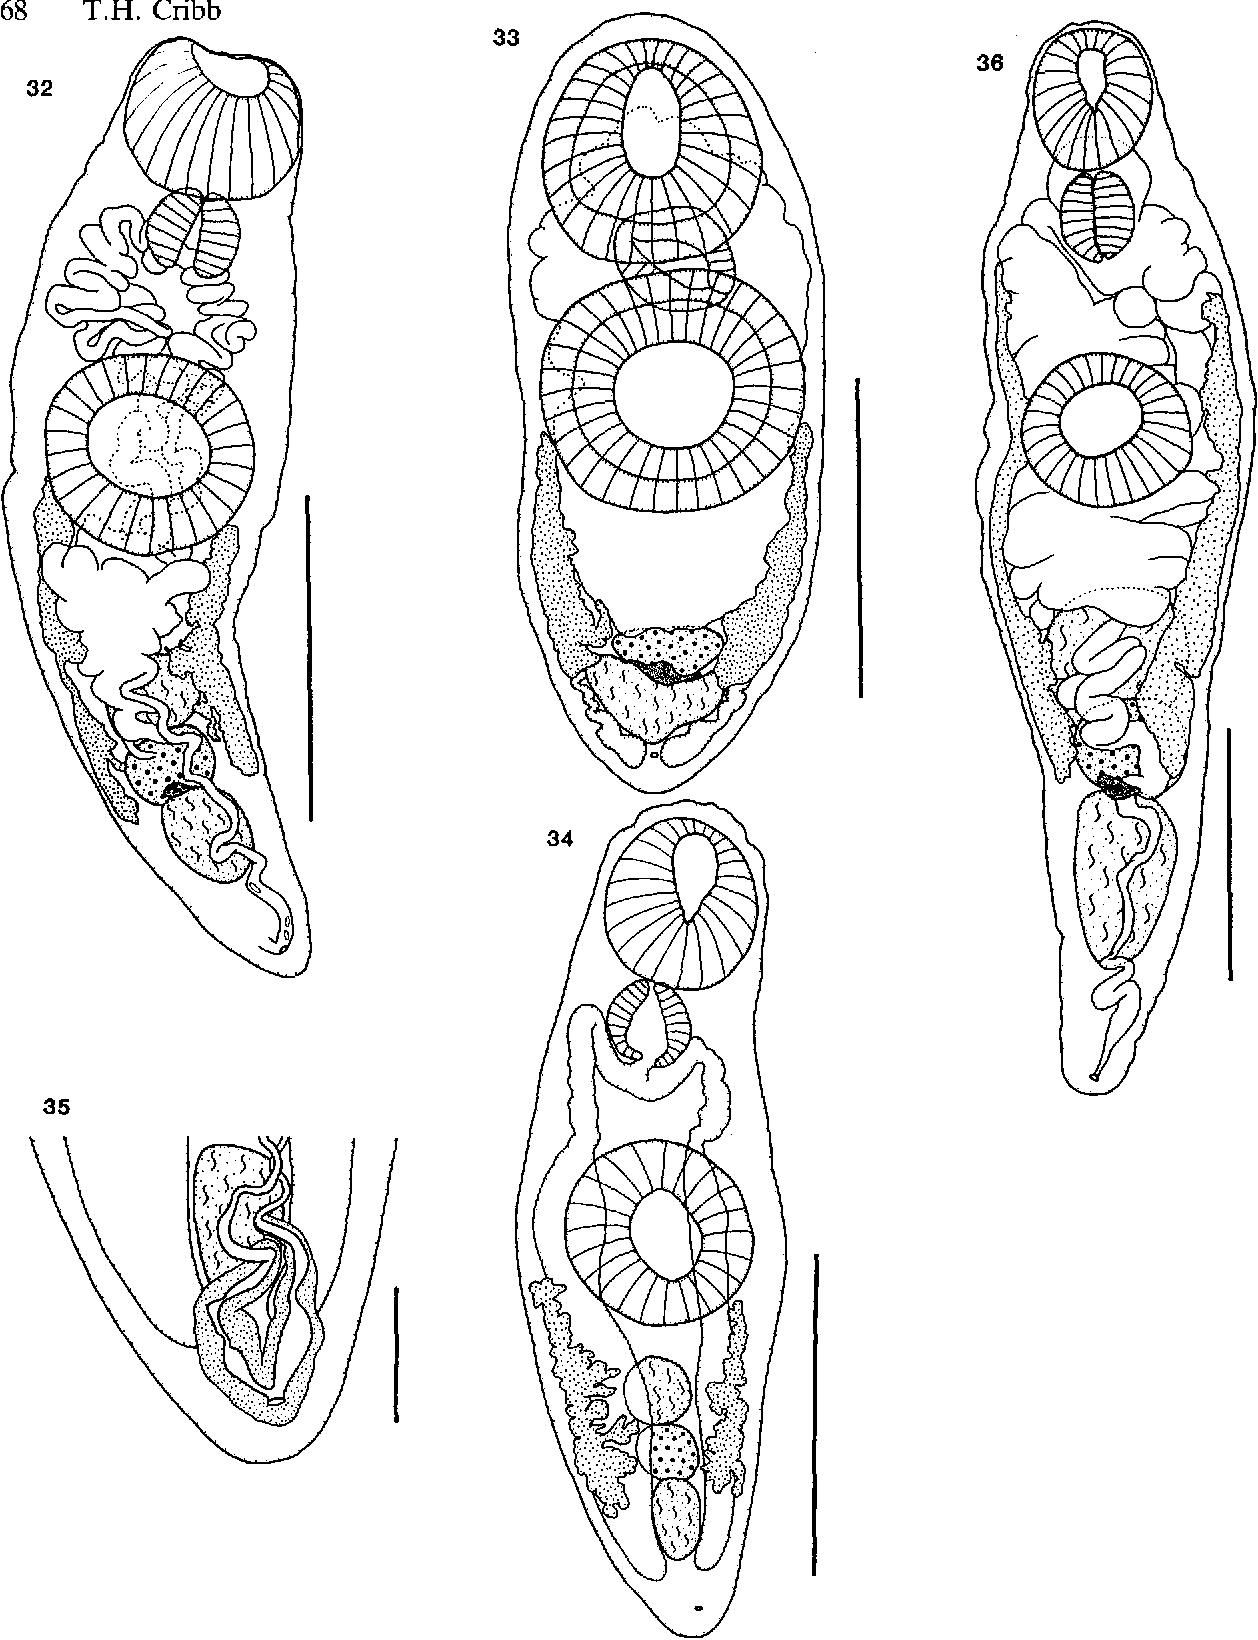 figure 32-36